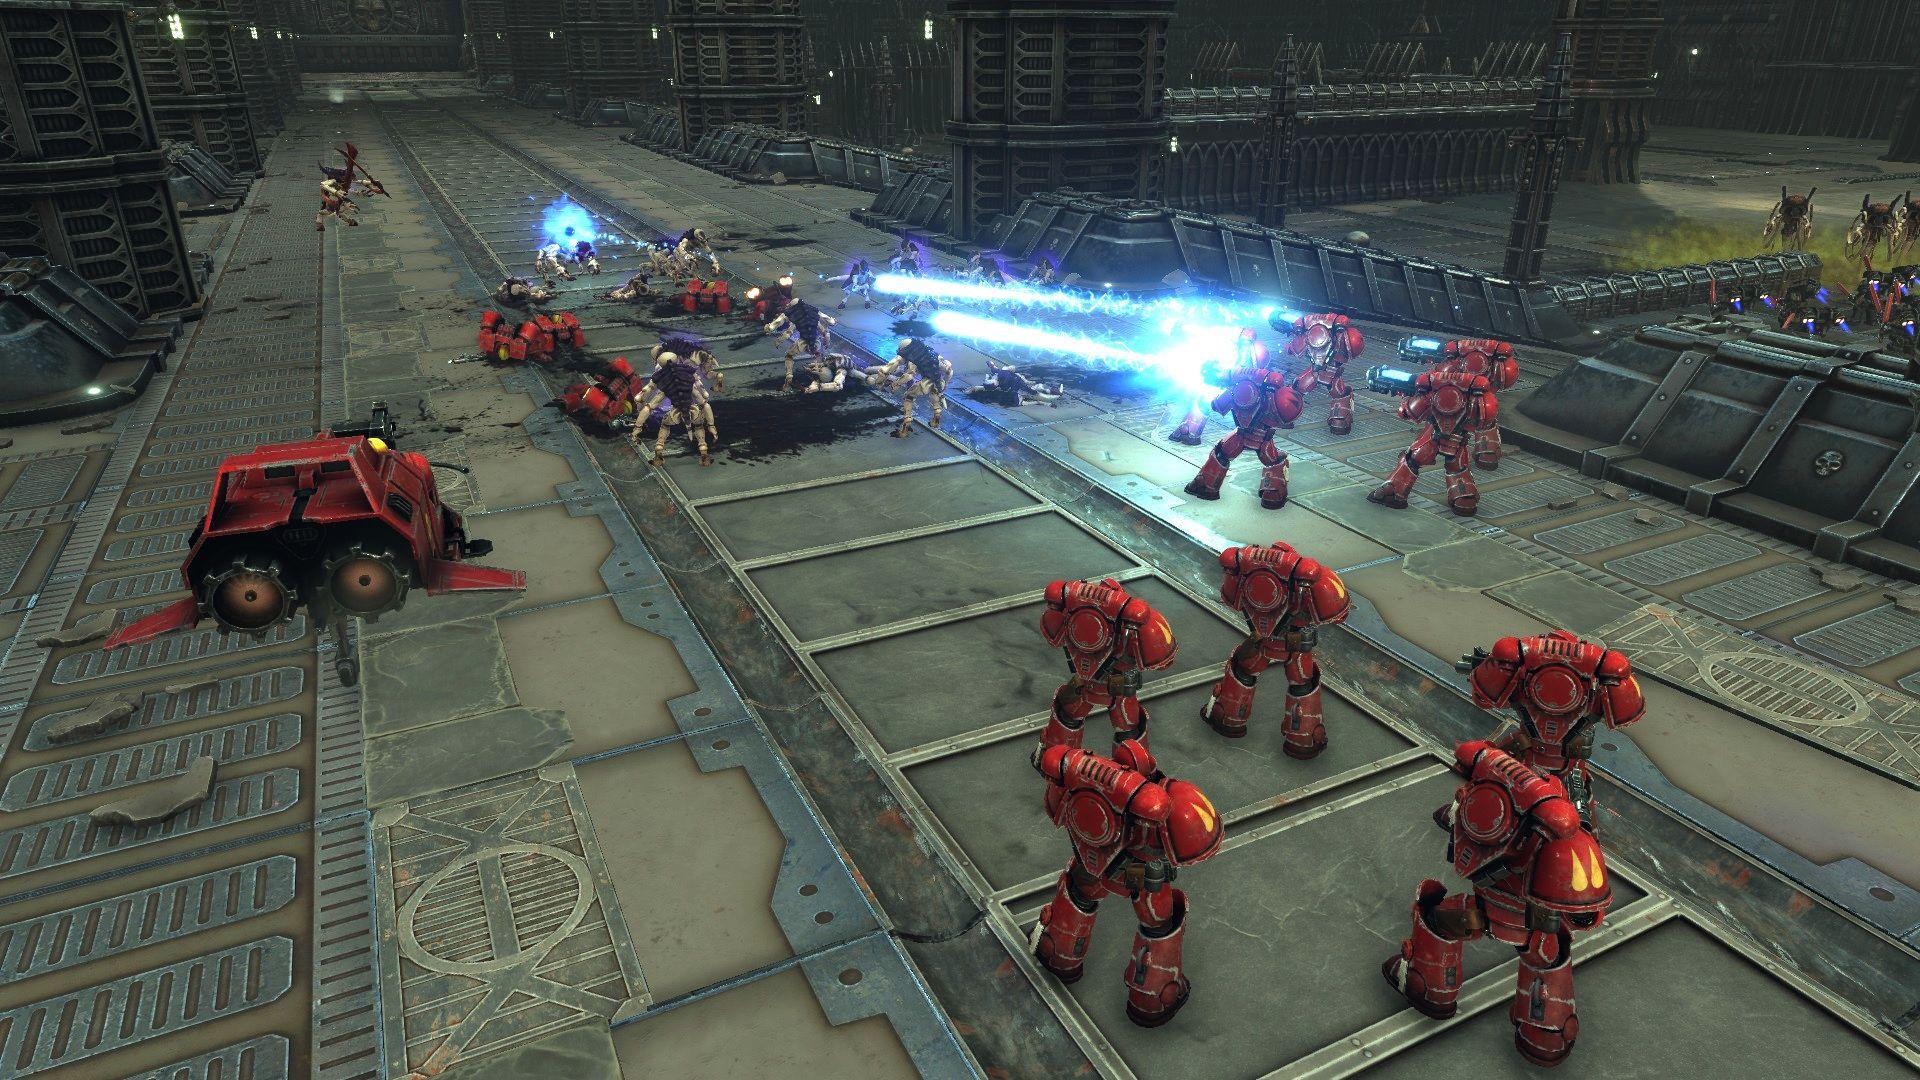 بررسی بازی Warhammer 40000